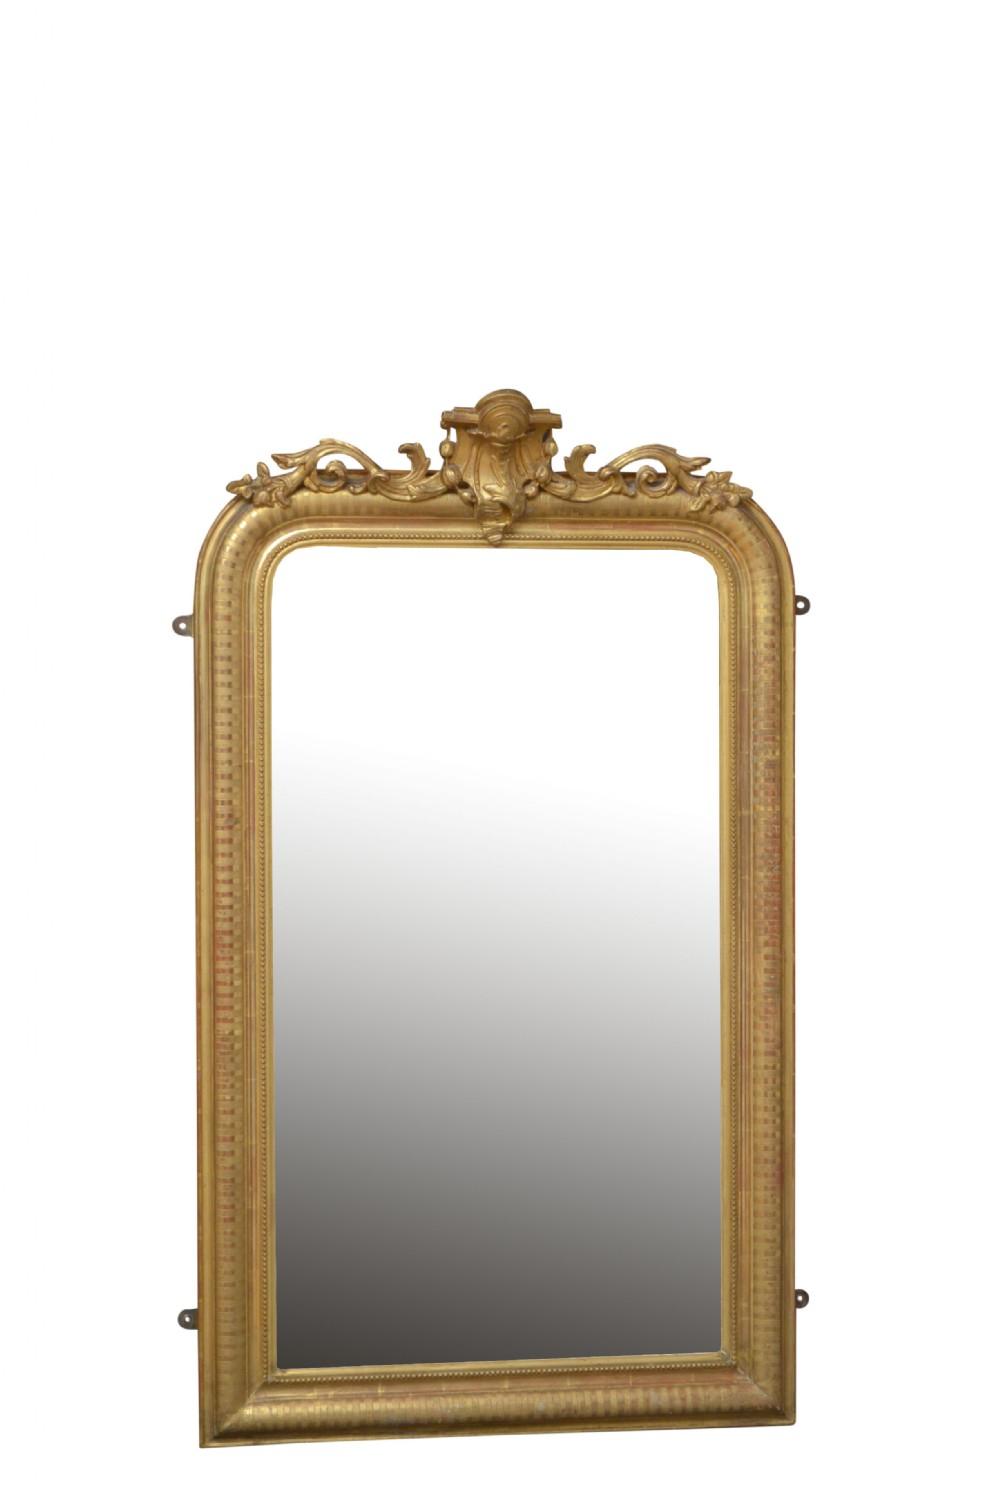 19th century louis philippe giltwood pier mirror